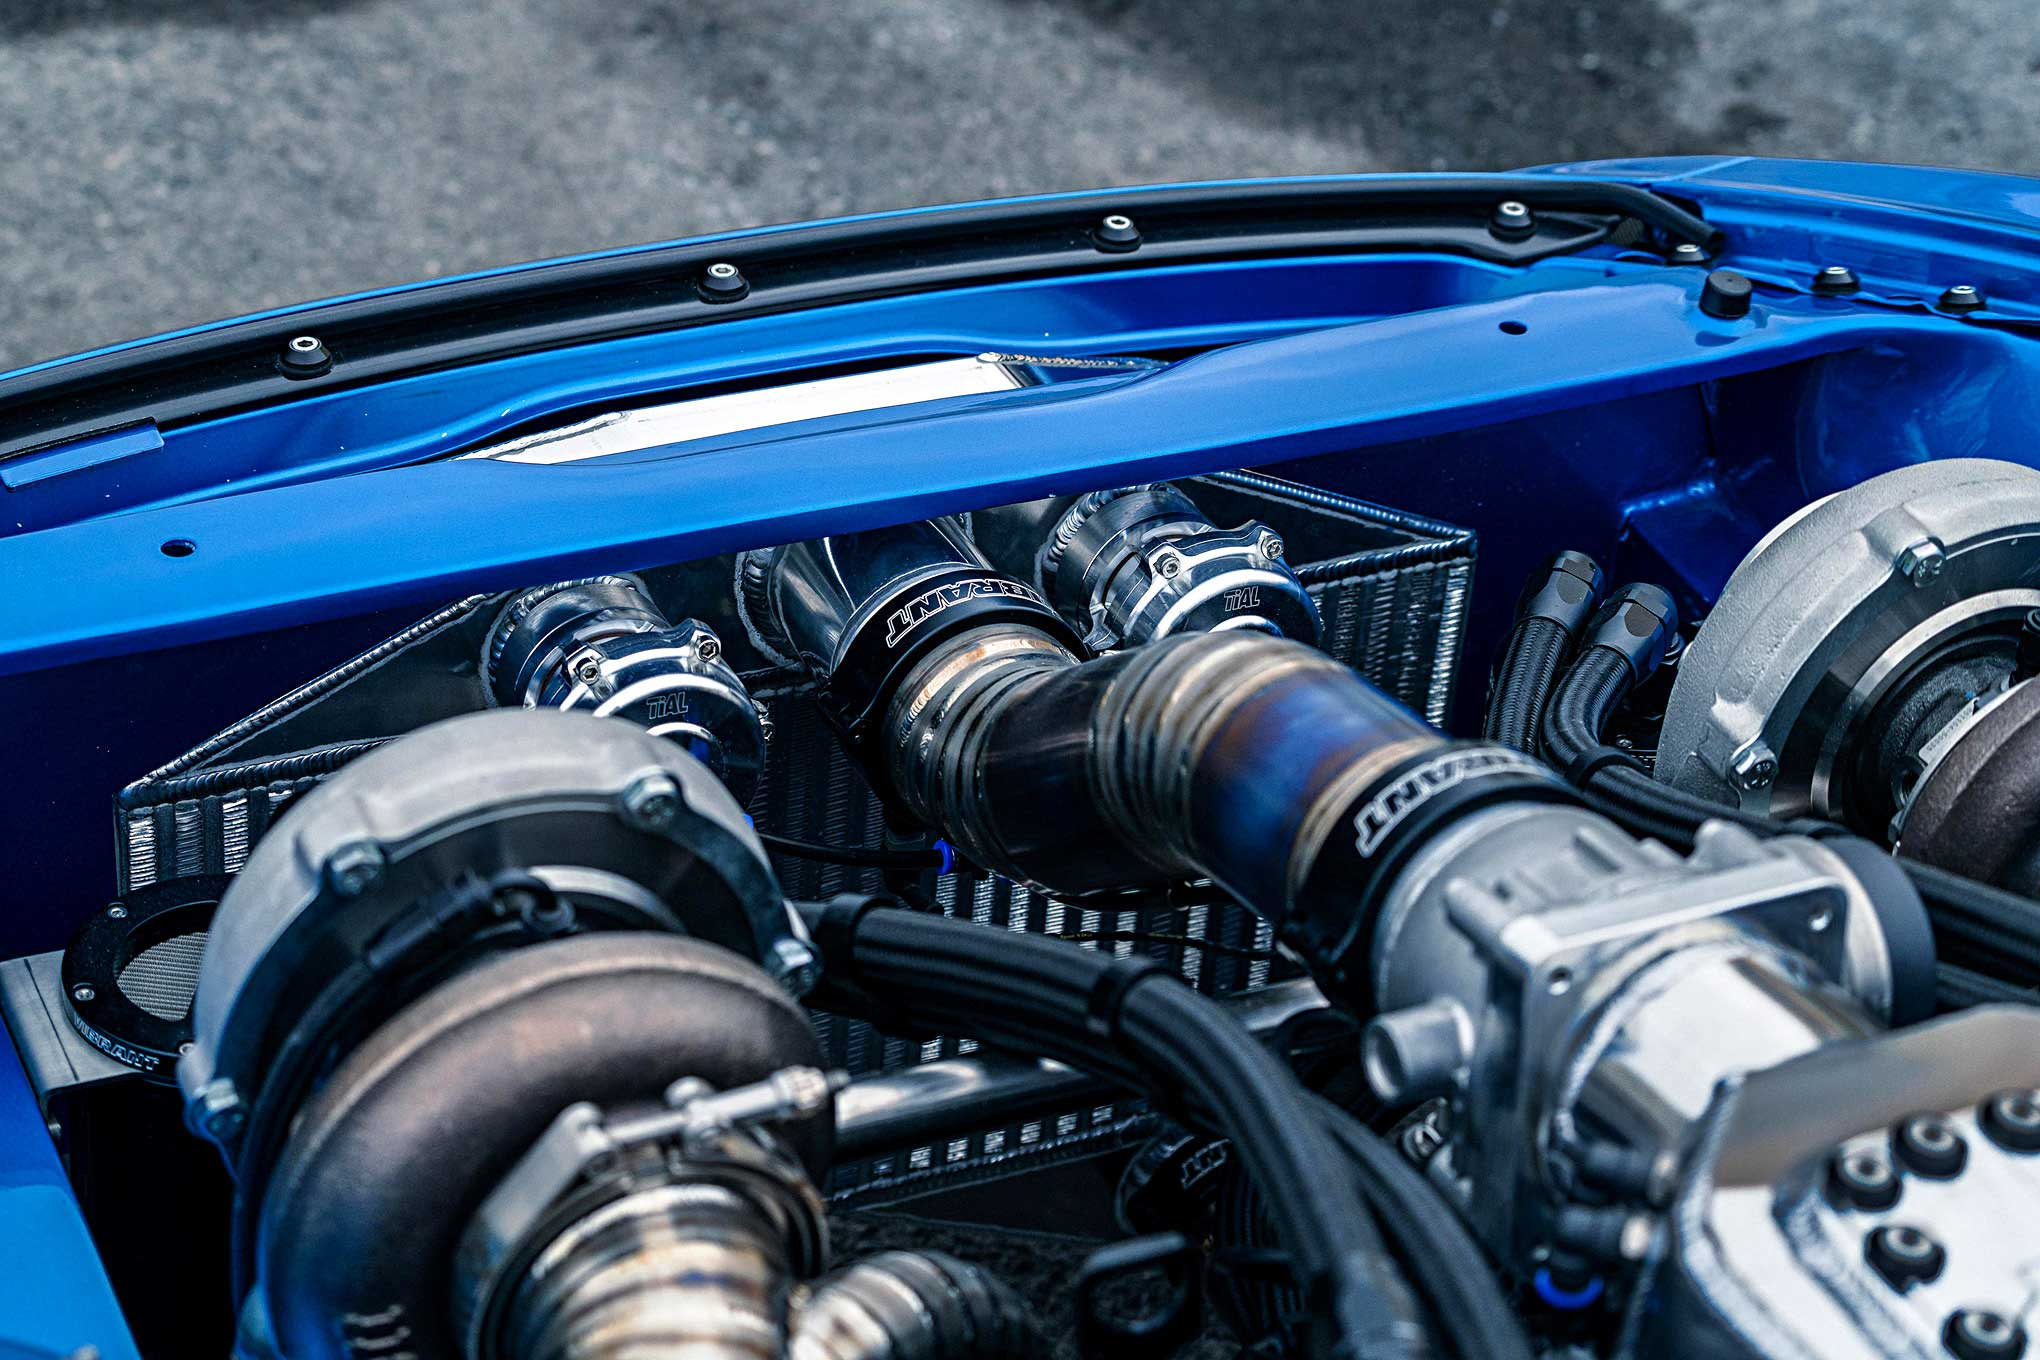 2006 Honda S2000 - Perfect Symmetry